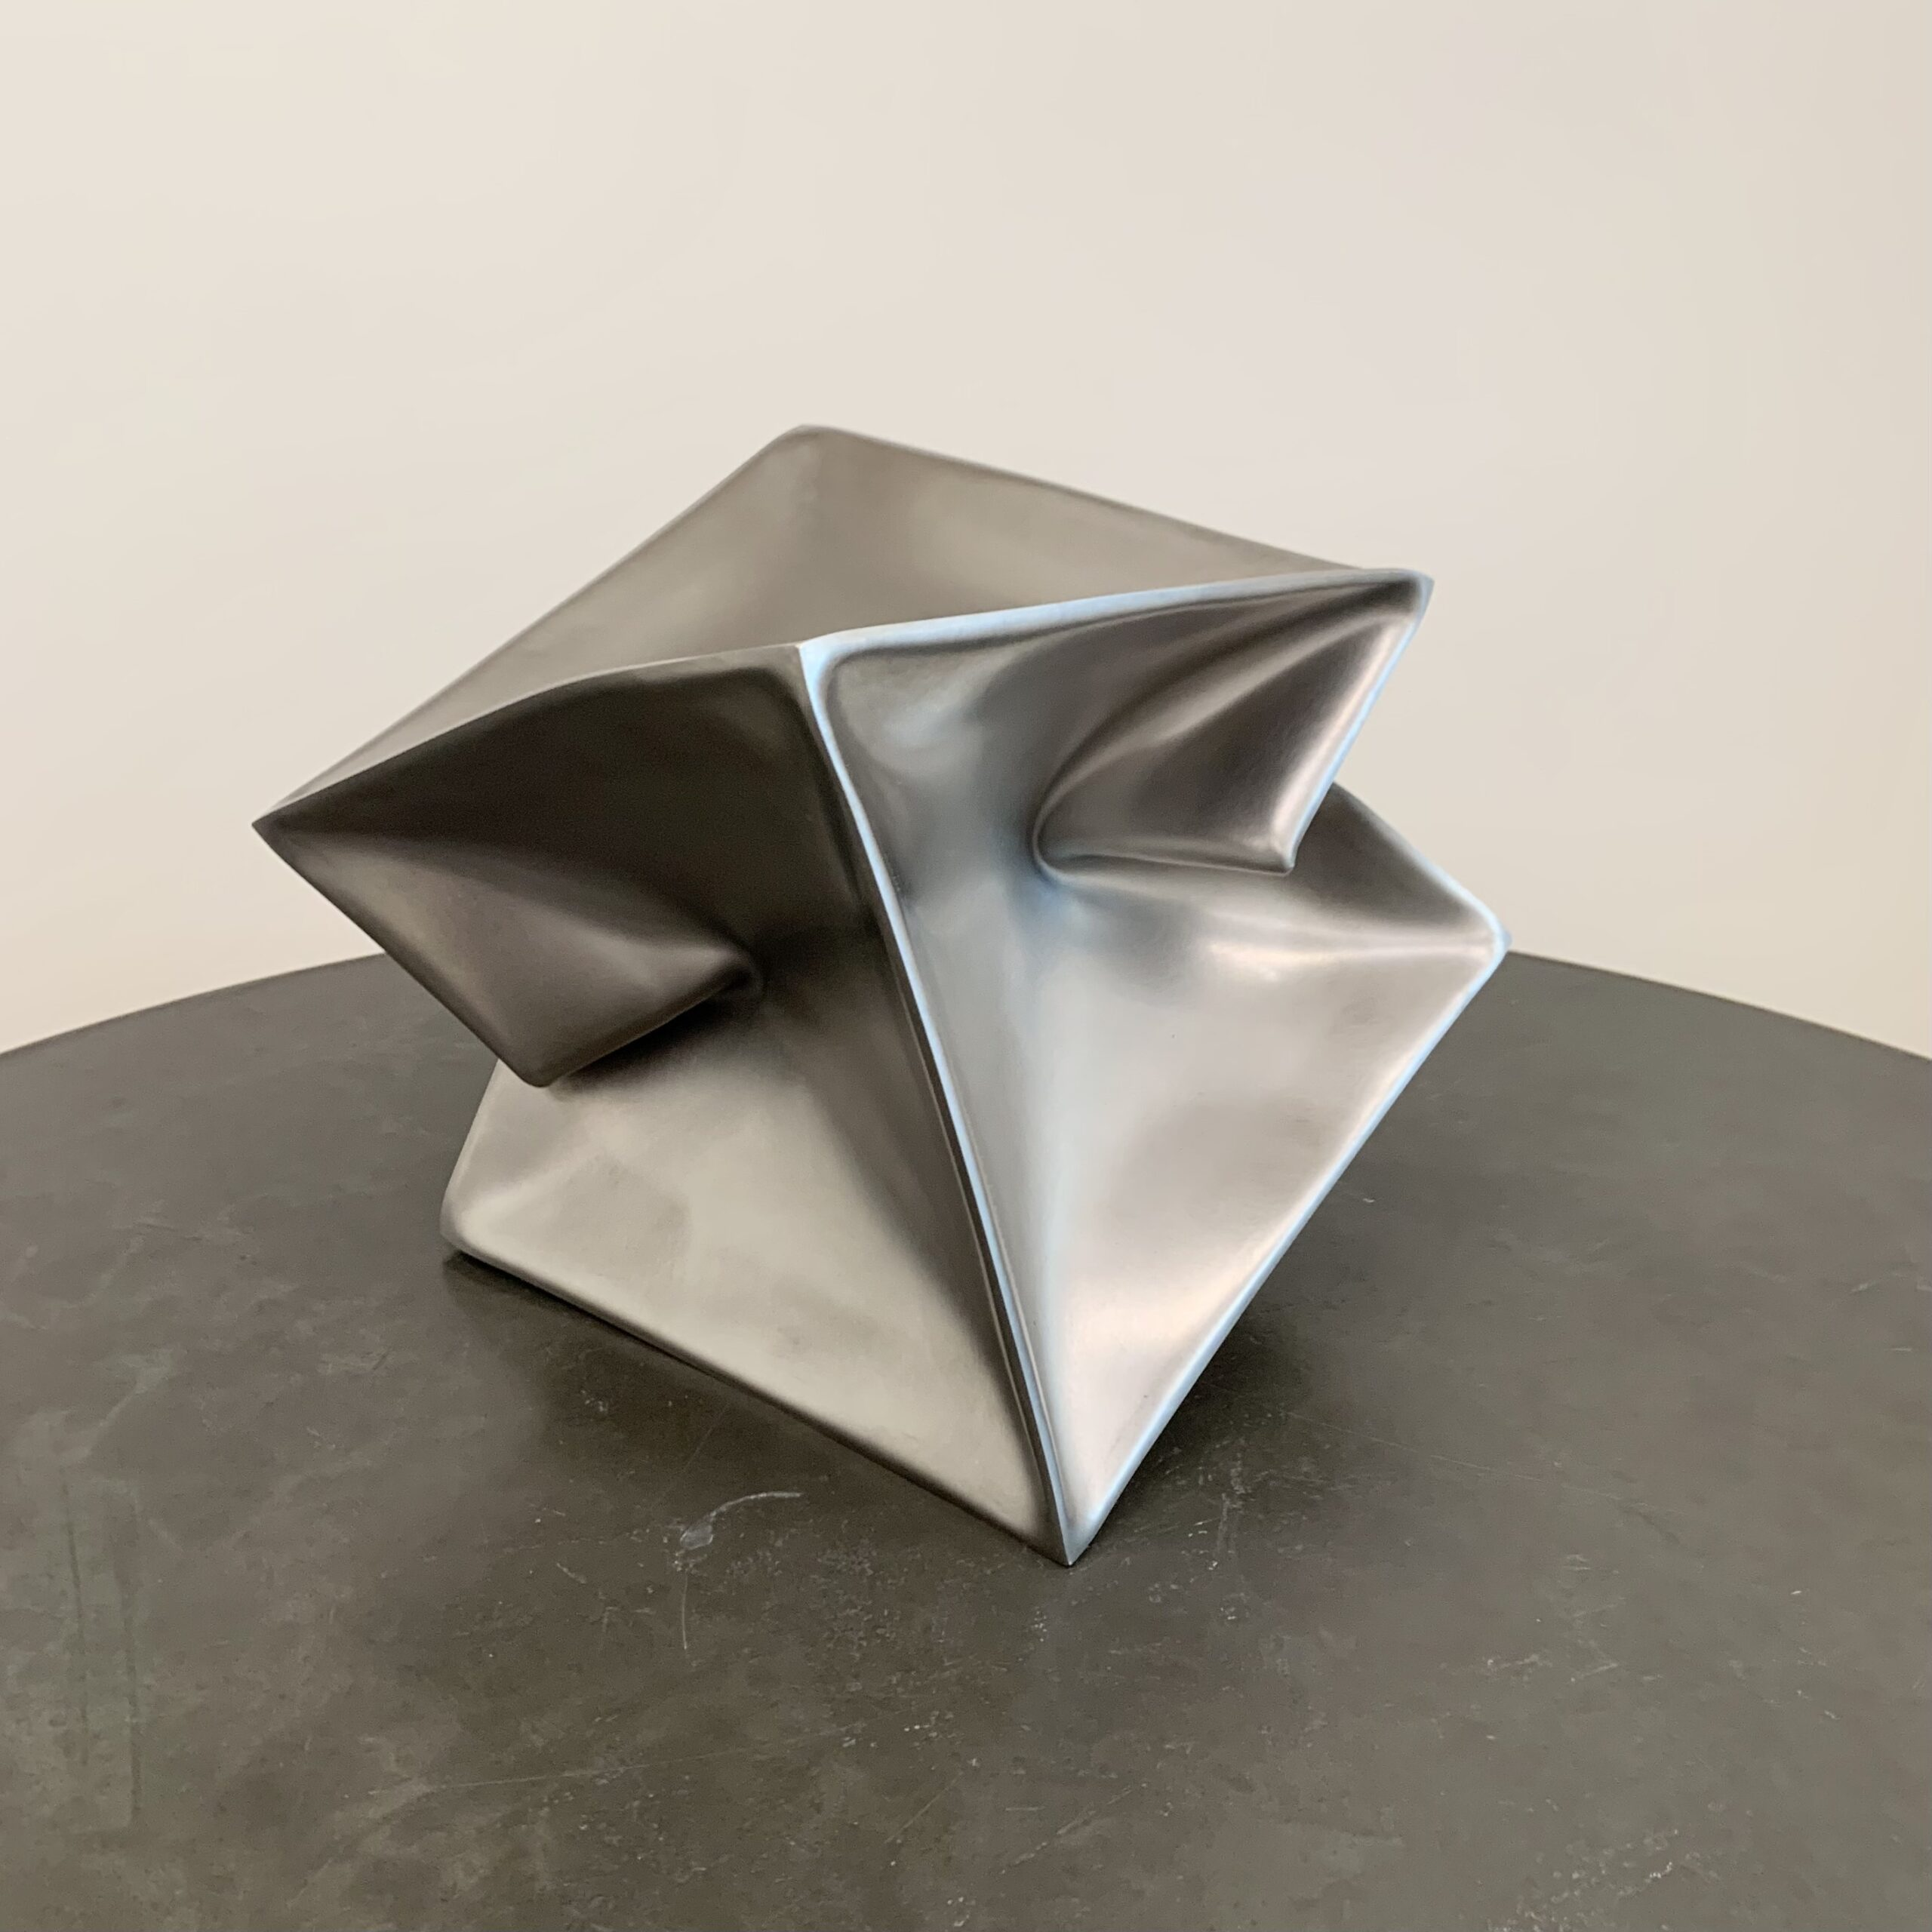 Ewerdt Hilgemann - Imploded Cube, 2002